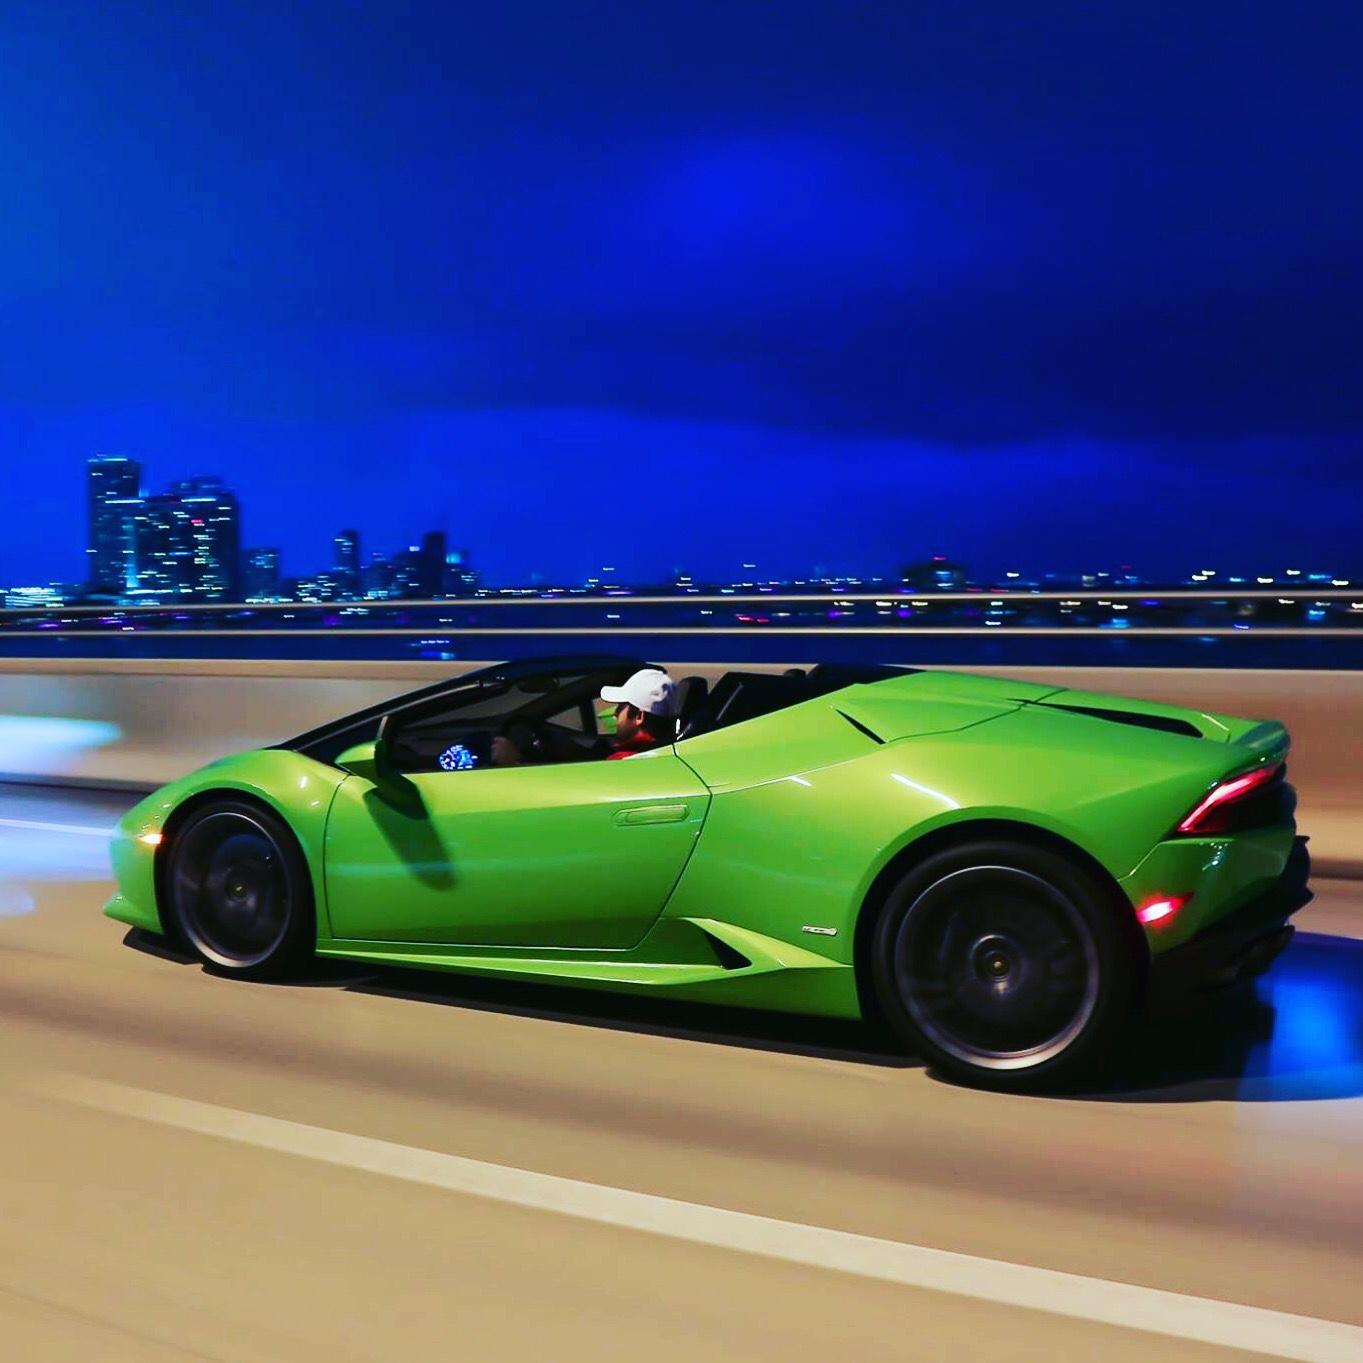 2017 Lamborghini Huracan Interior: Lamborghini Huracan Spyder Picture Thread